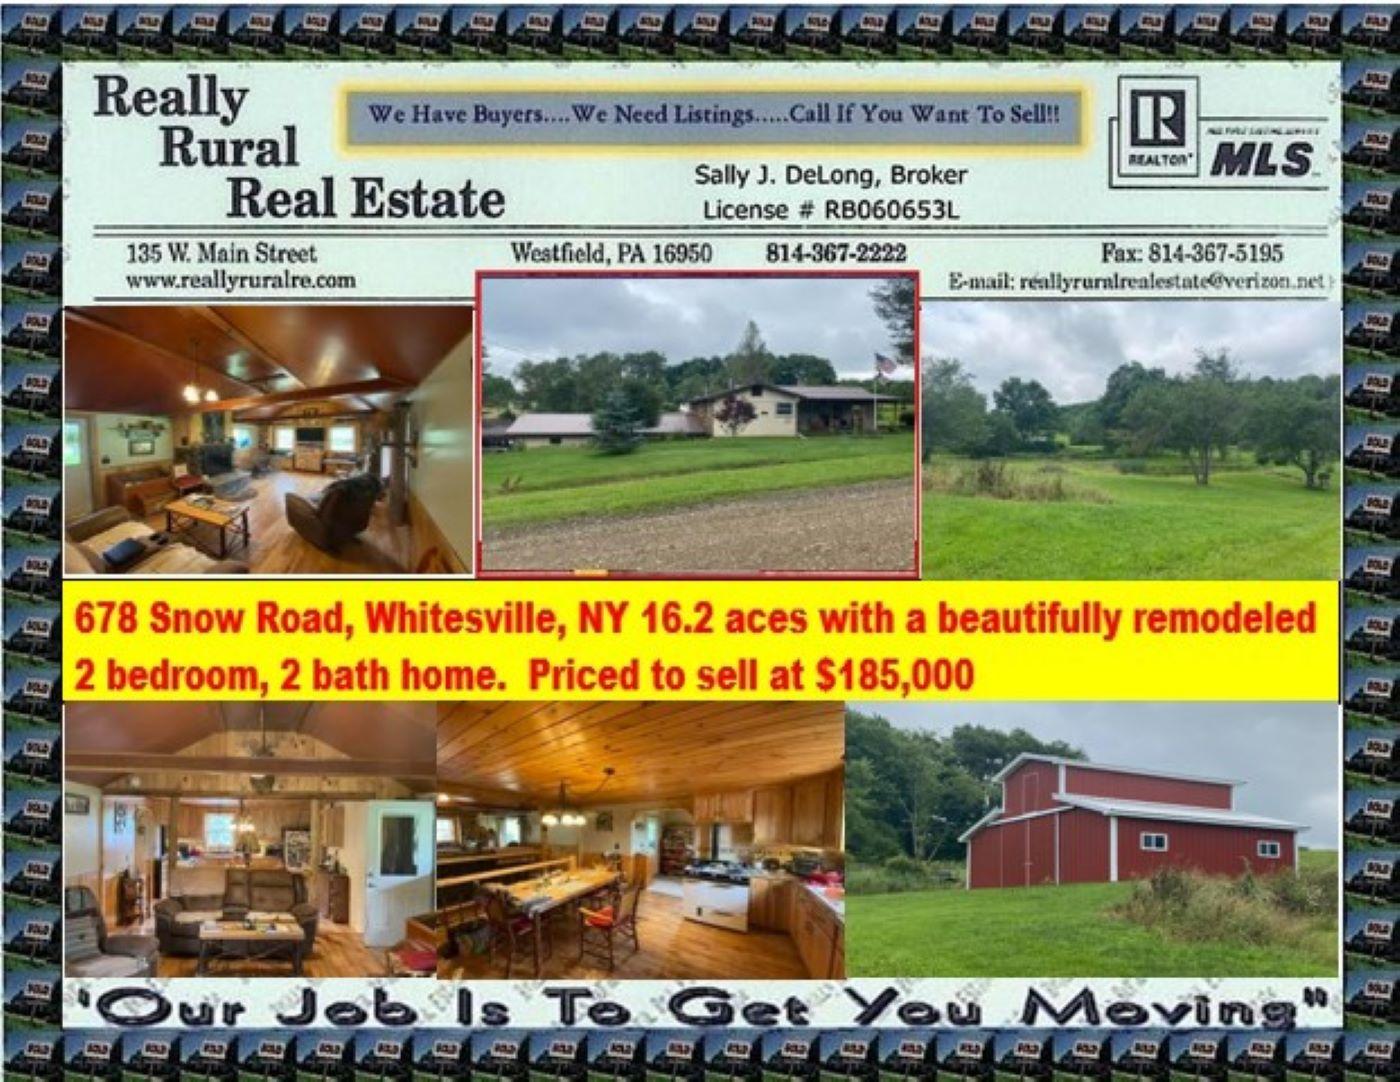 Really Rural